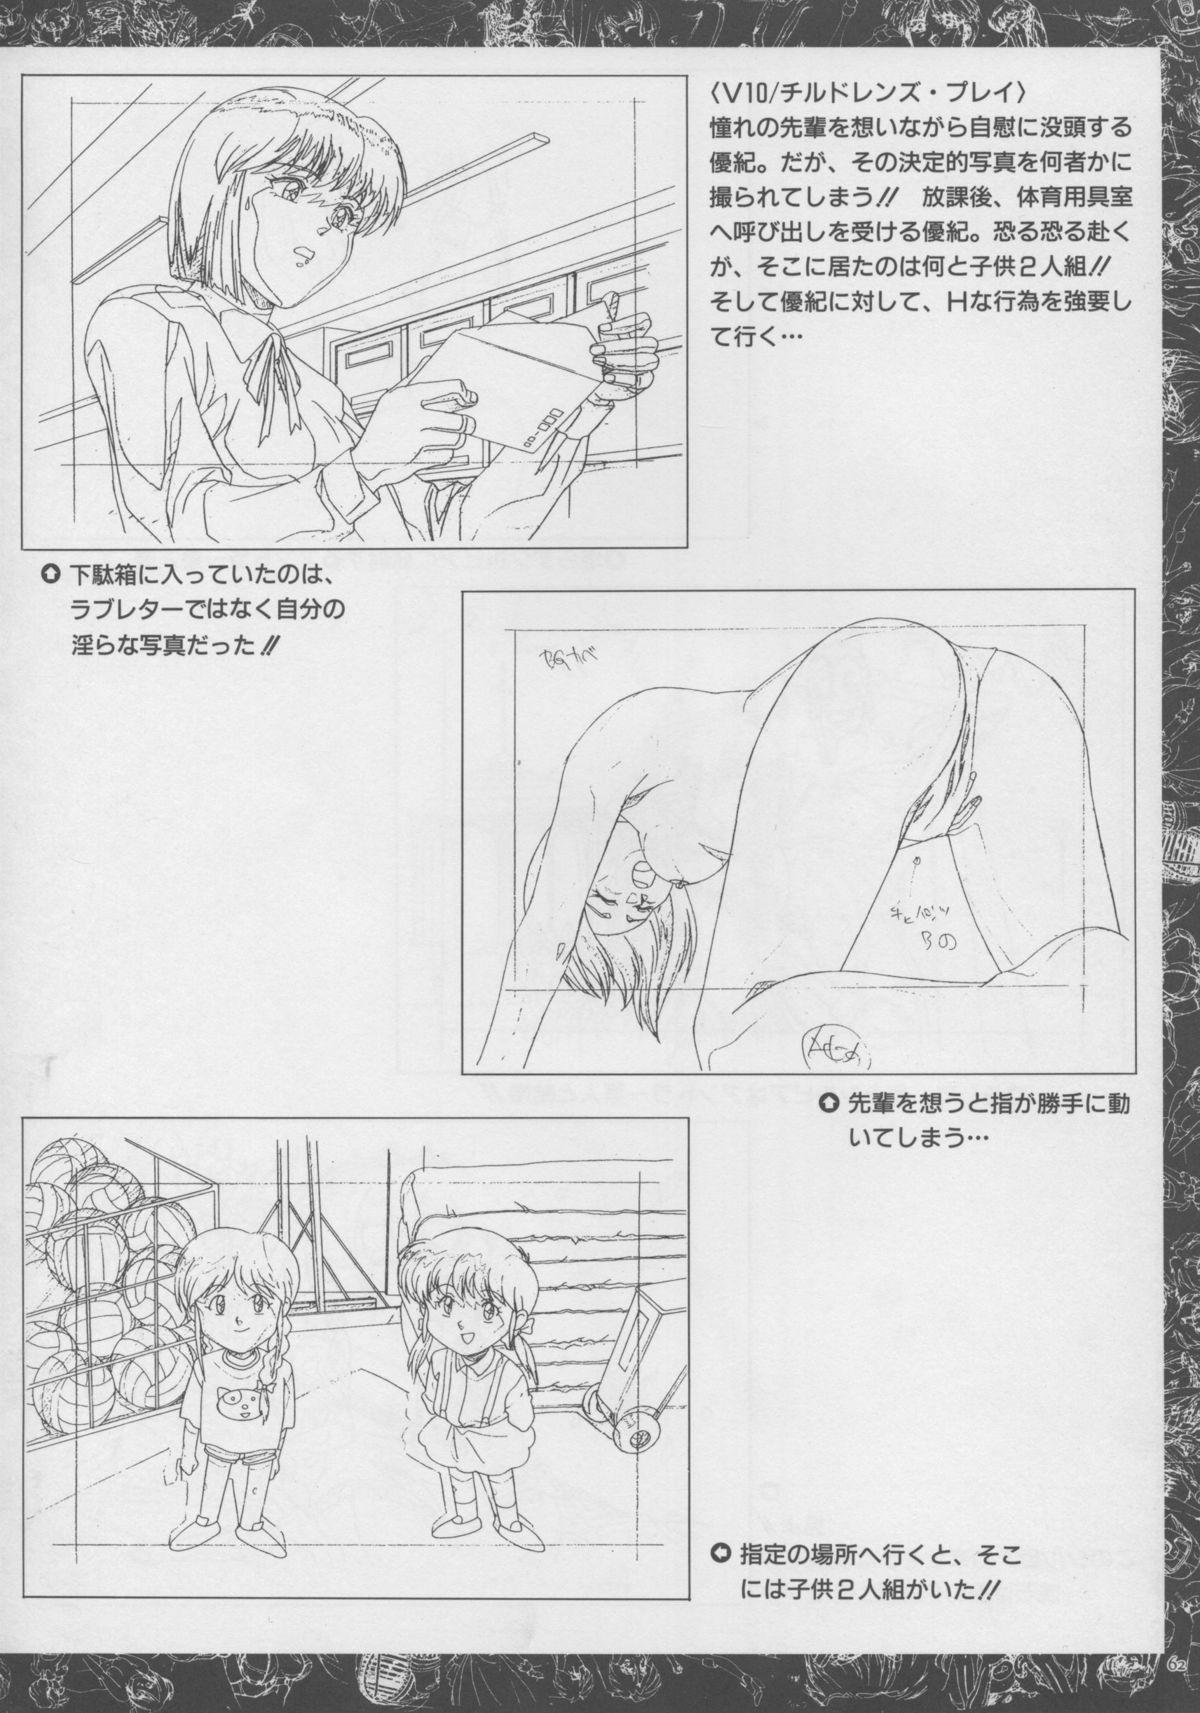 VIPER Series Official Artbook 60